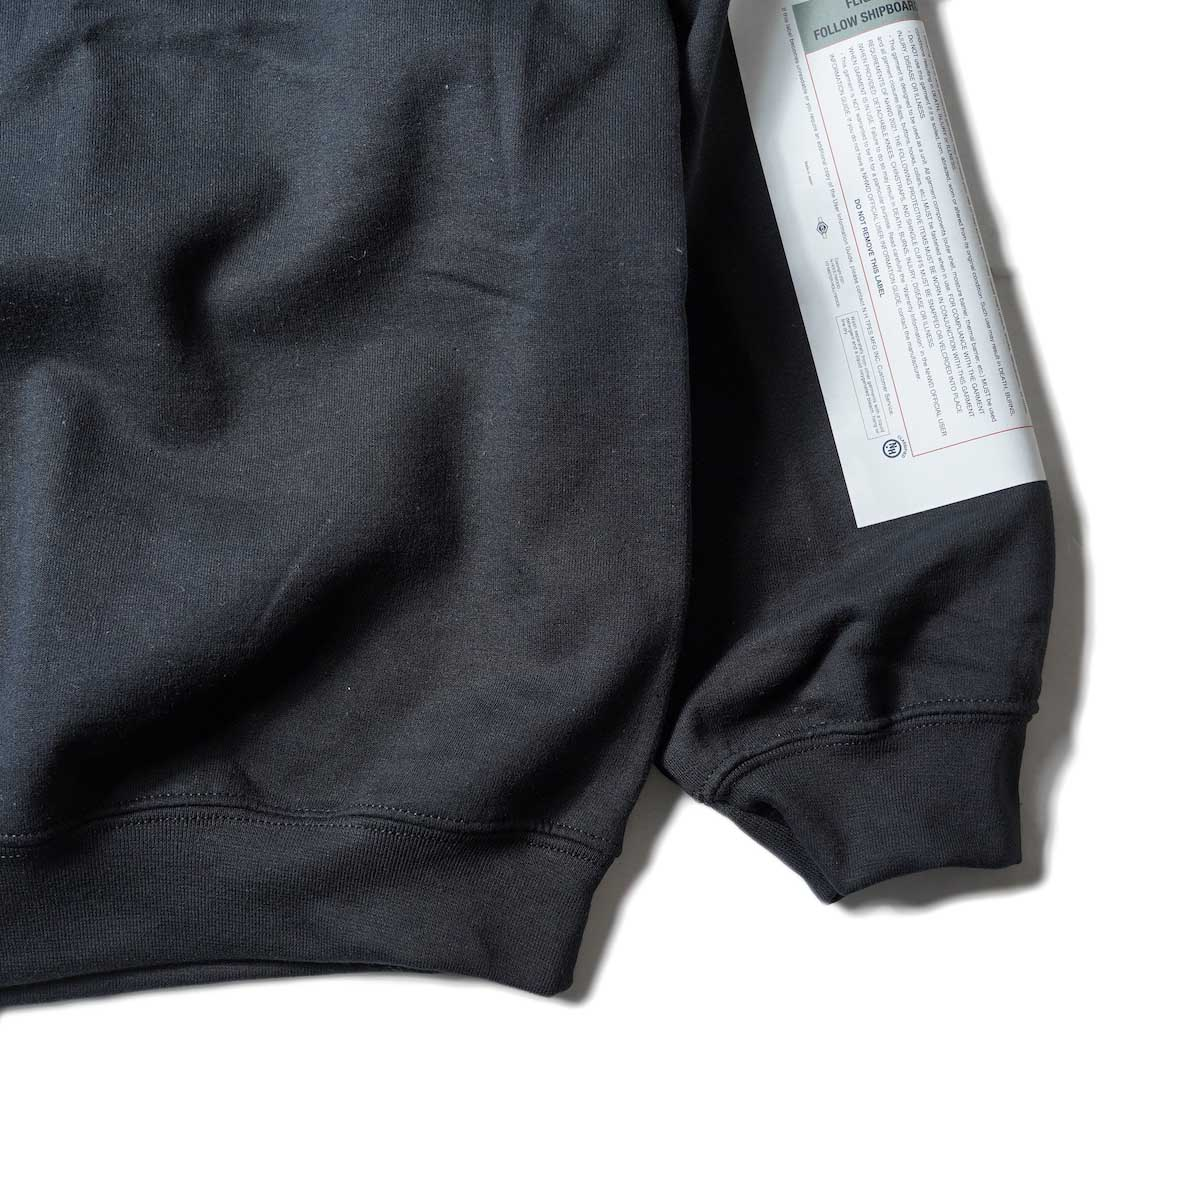 N.HOOLYWOOD / 9212-CS85 Crew Neck Sweat Shirt (Black)袖、裾